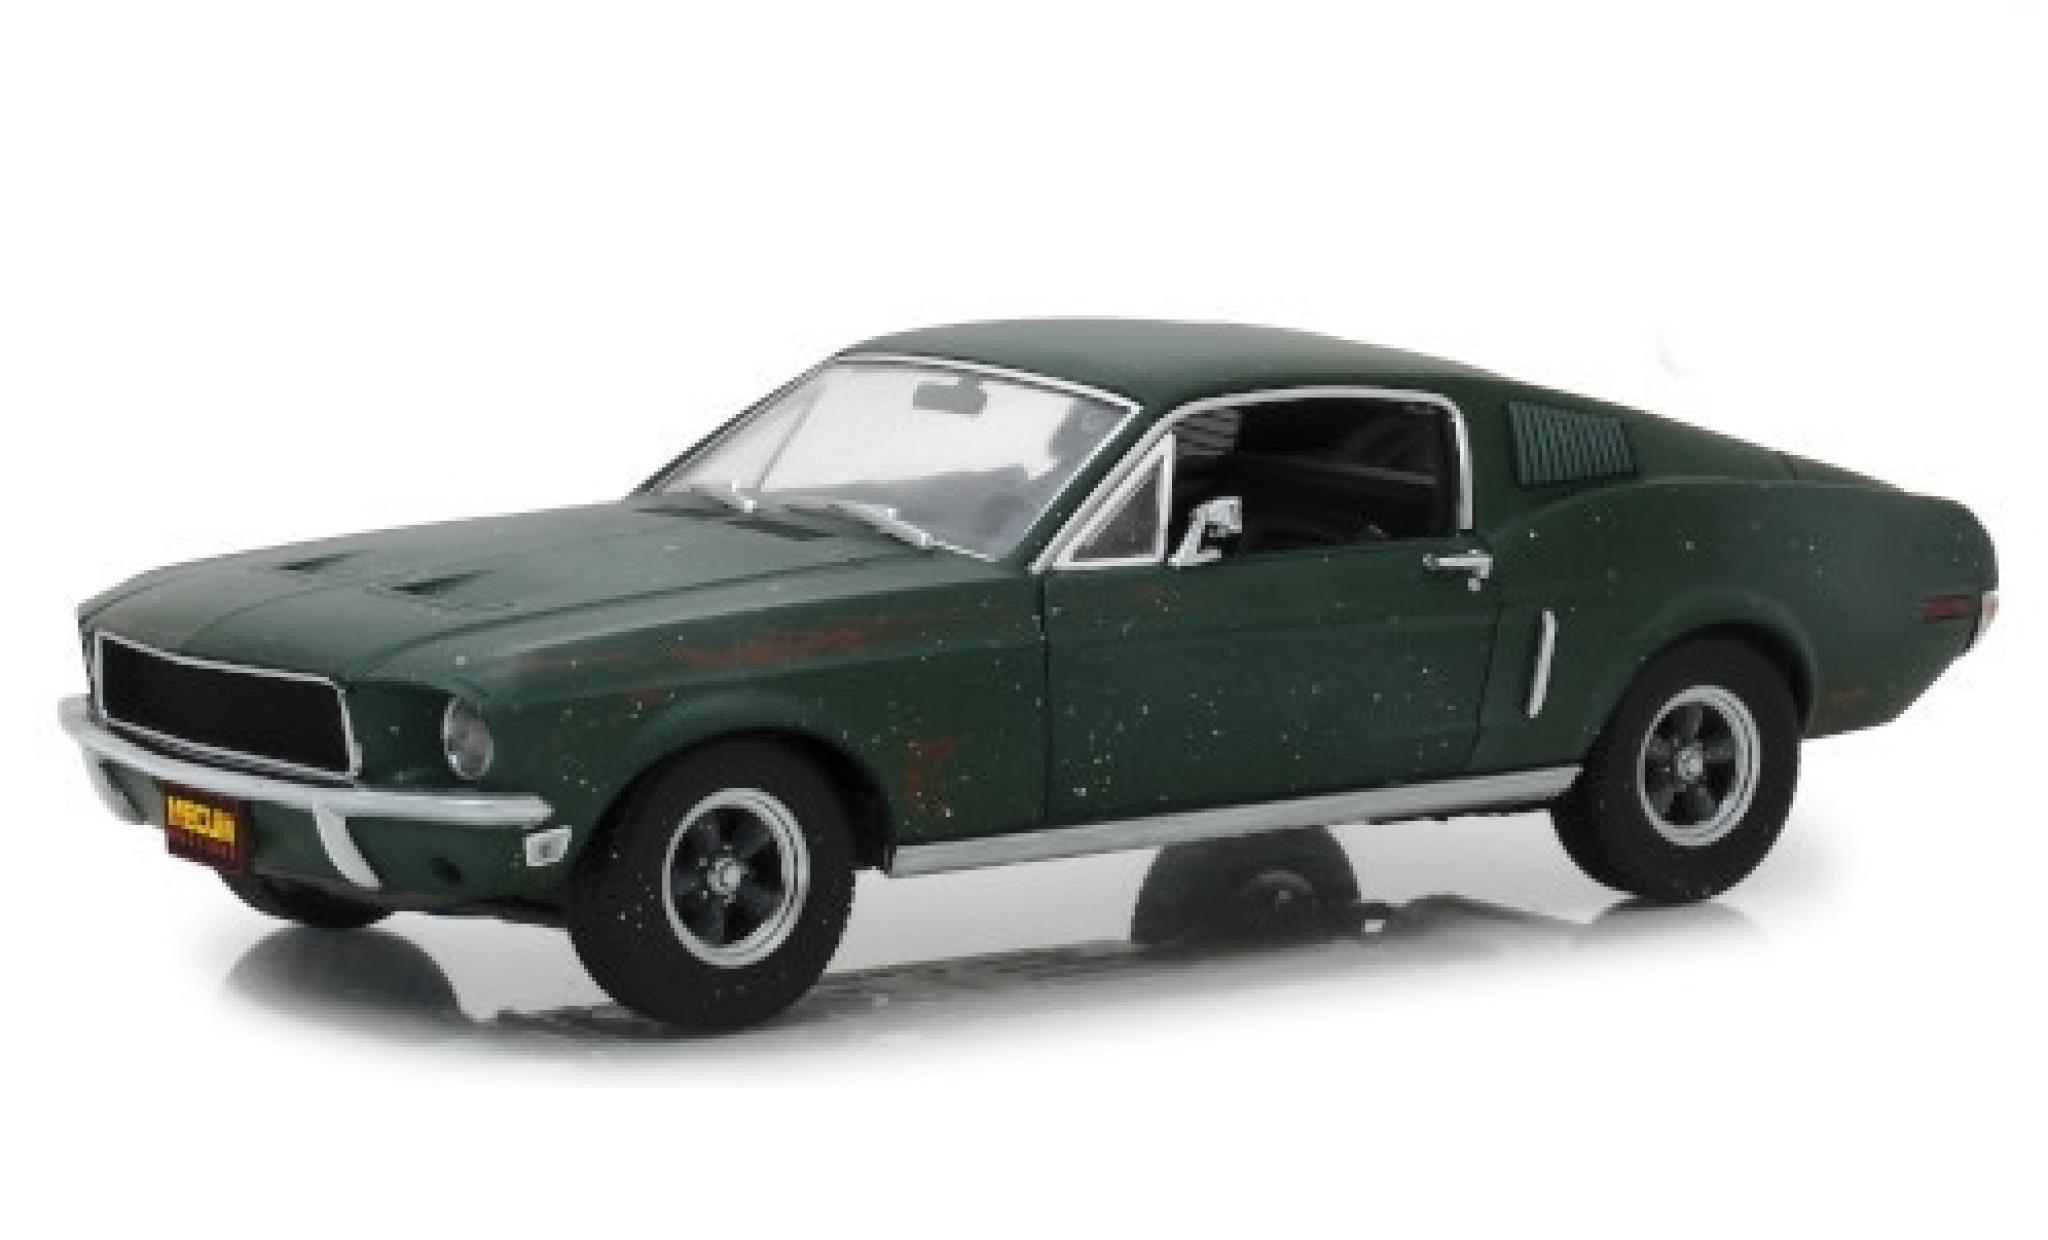 Ford Mustang 1/18 Greenlight GT Fastback métallisé verte Bullitt 1968 unrestauriert mit Stickerbogen